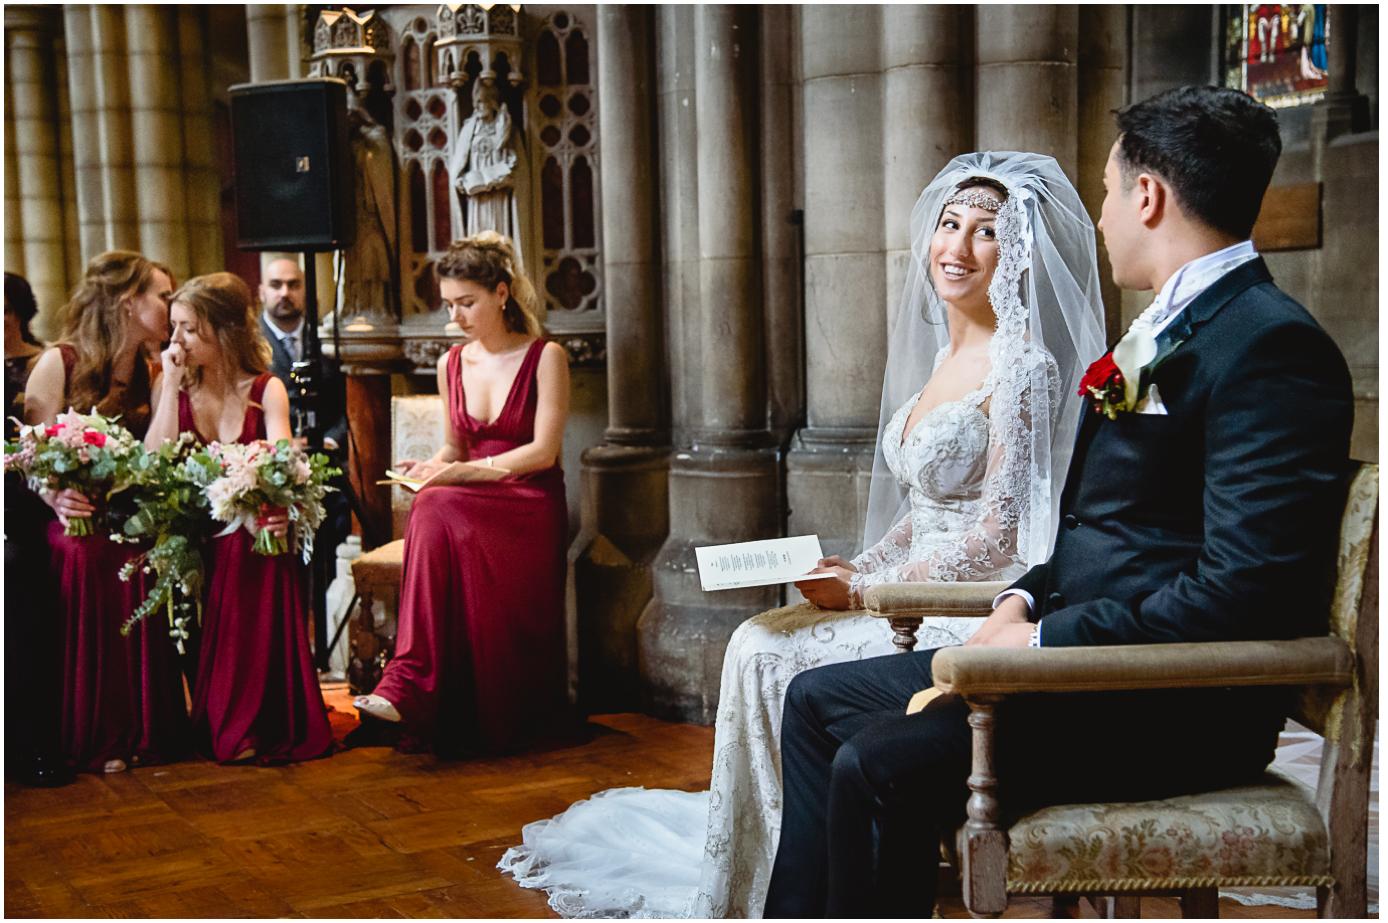 iranian wedding photographer 70 - Drapers Hall London Wedding Photographer